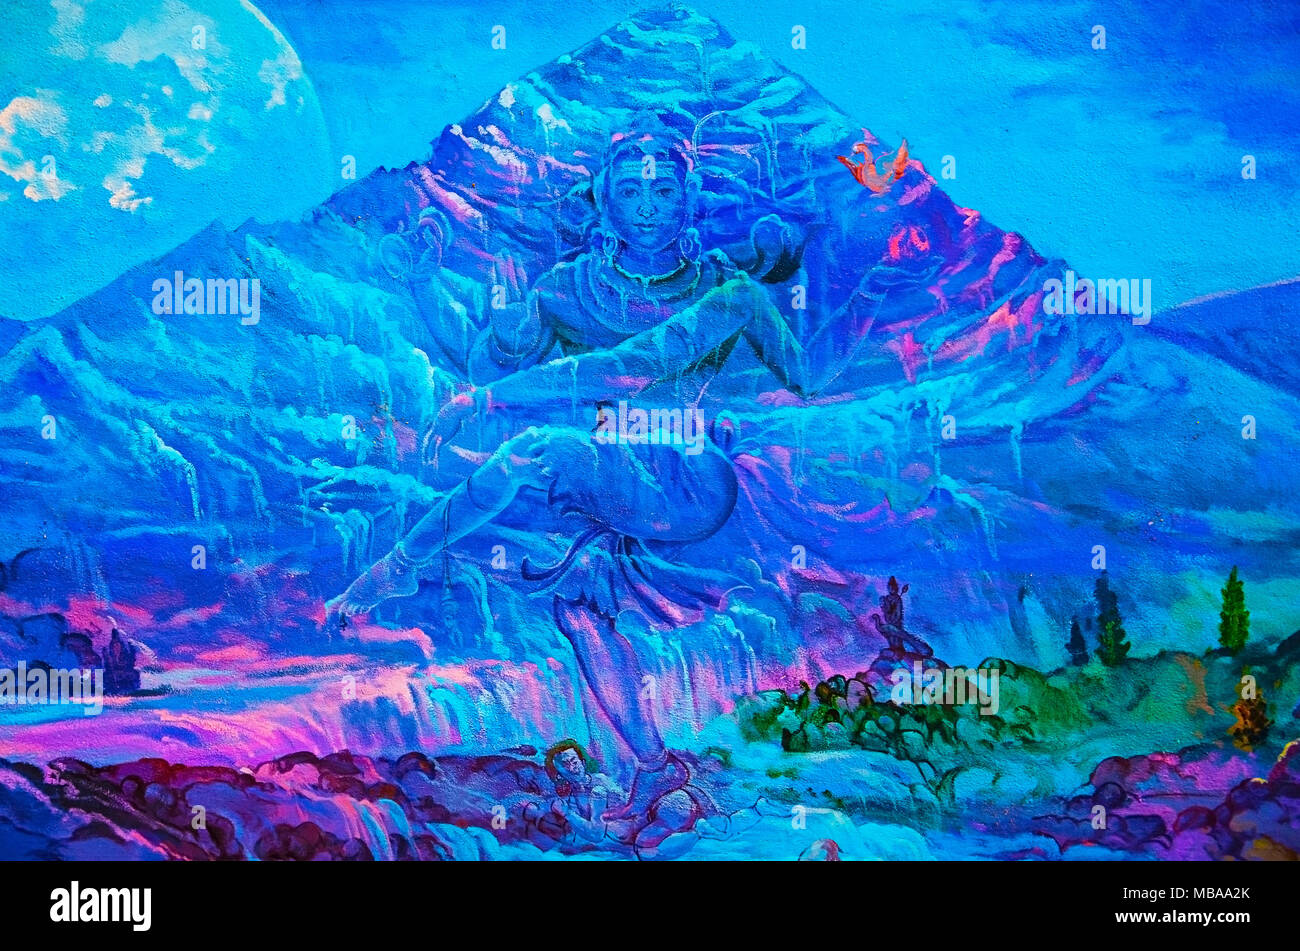 Lord Shiva Paintings Stock Photos & Lord Shiva Paintings Stock